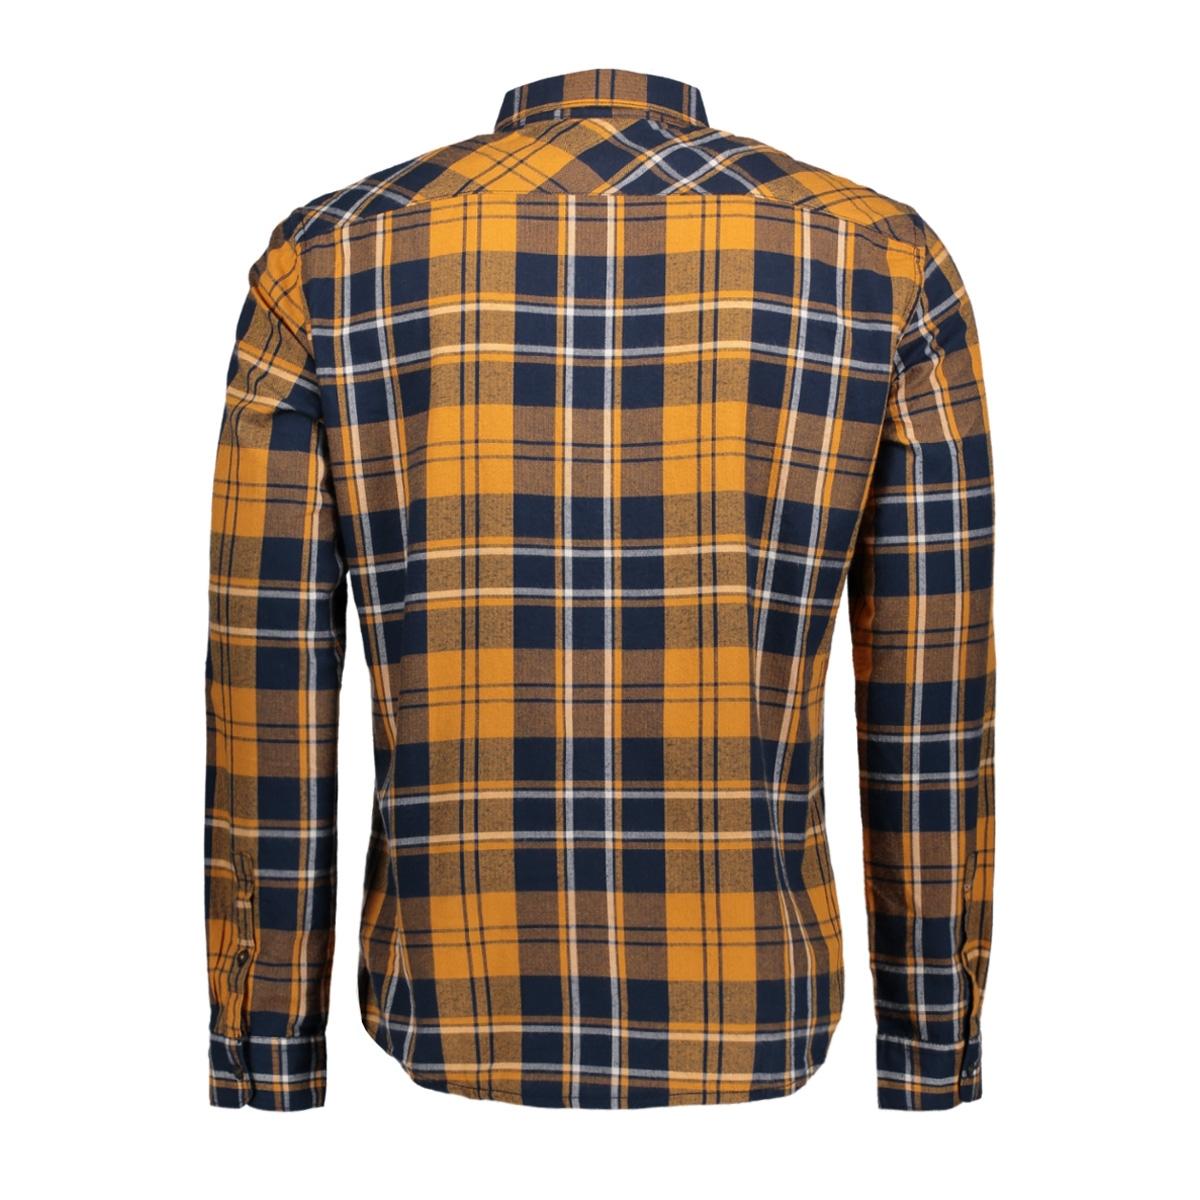 2055066.00.12 tom tailor overhemd 3252